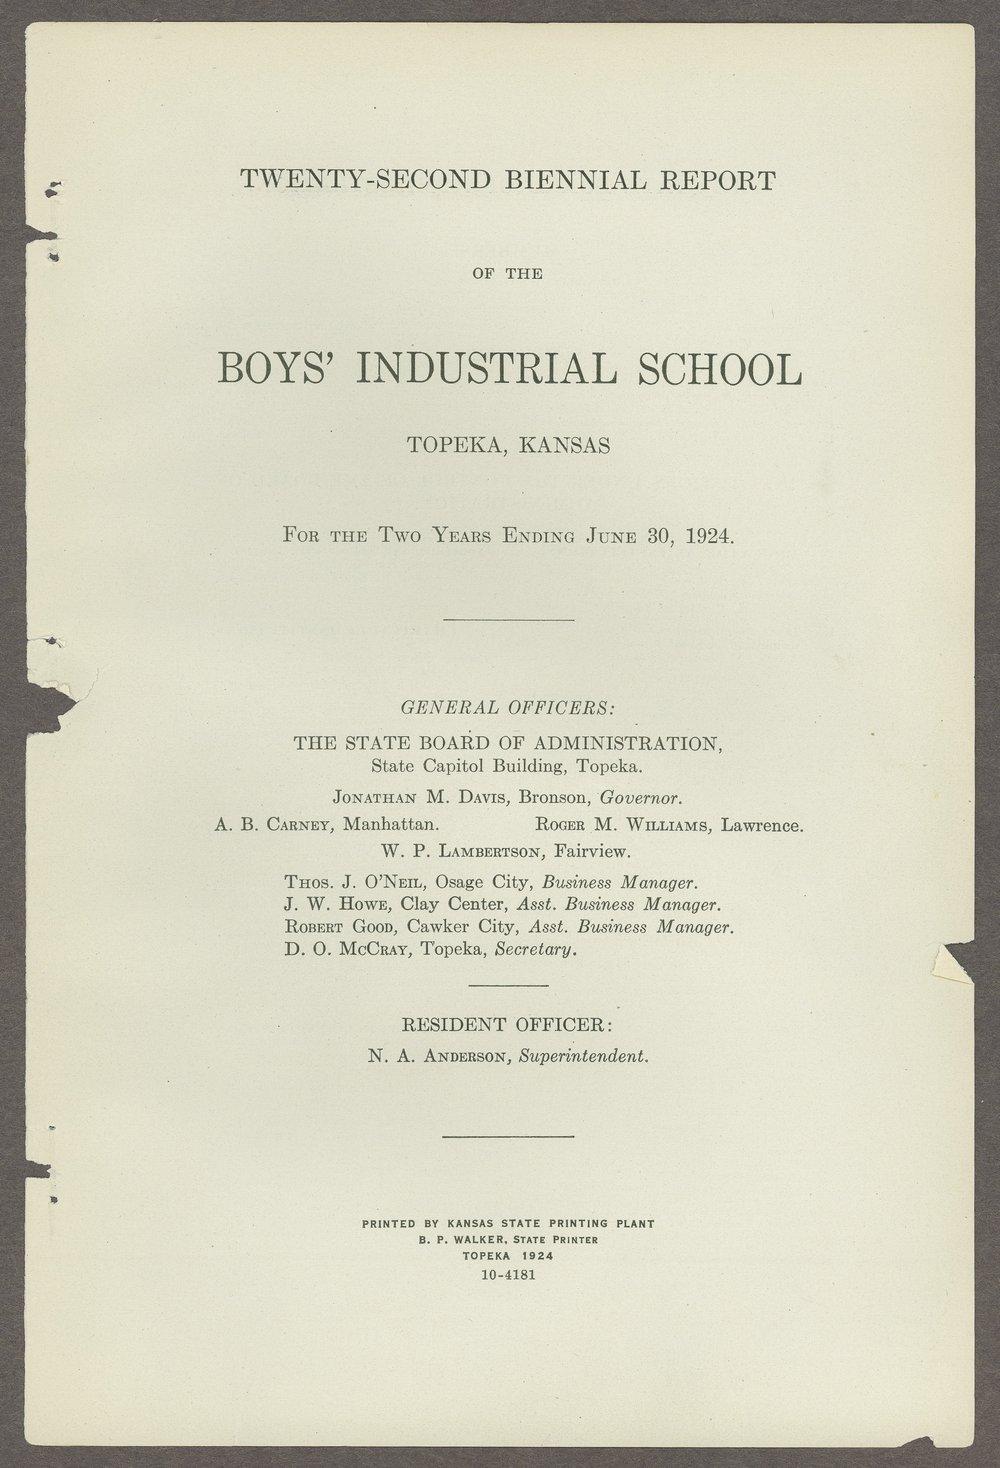 Biennial report of the Boys Industrial School, 1924 - 1